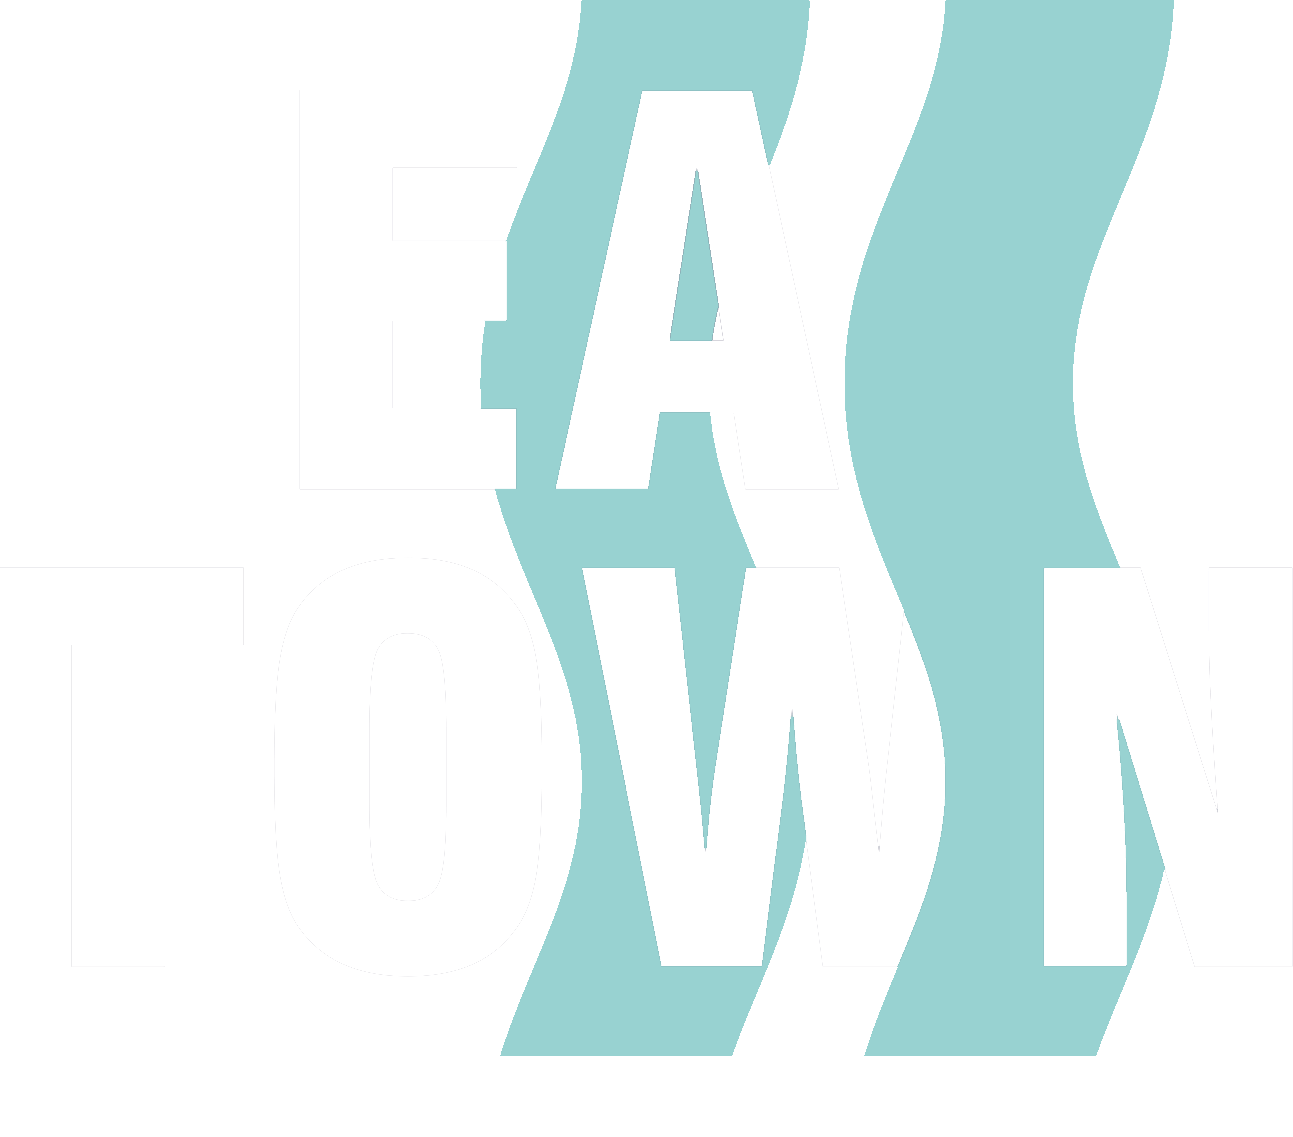 ЖК Sea Town